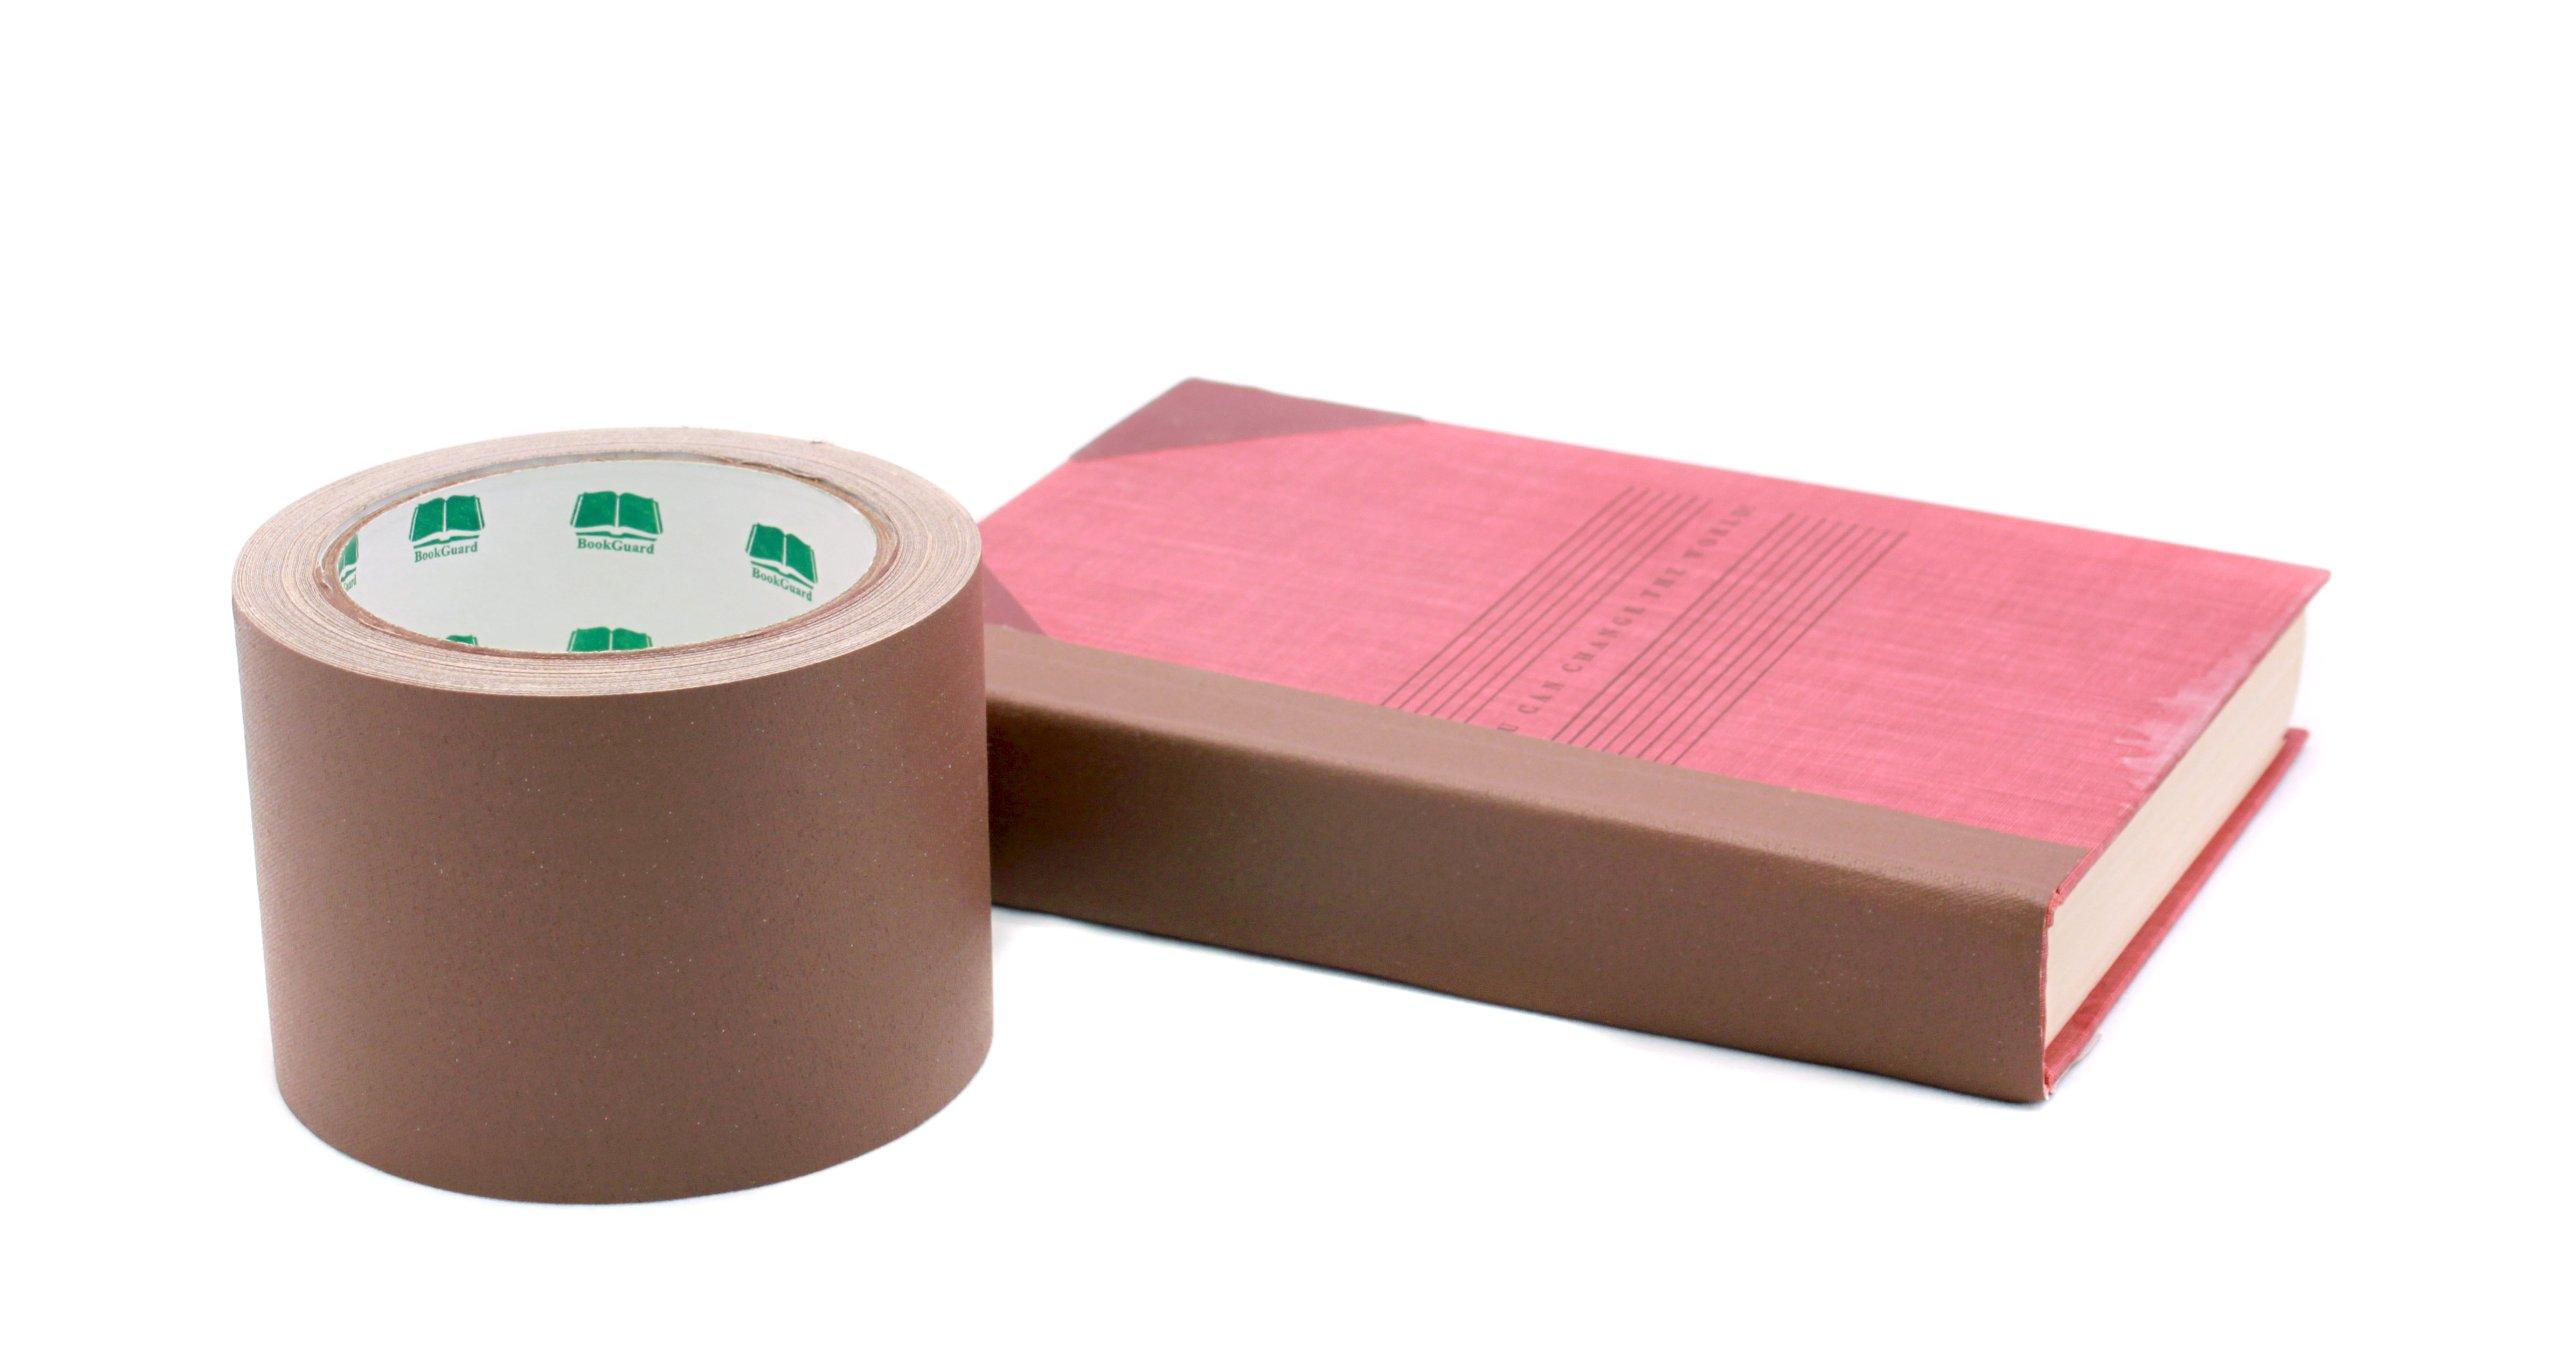 3'' Black Colored Premium-Cloth Book Binding Repair Tape | 15 Yard Roll (BookGuard Brand)